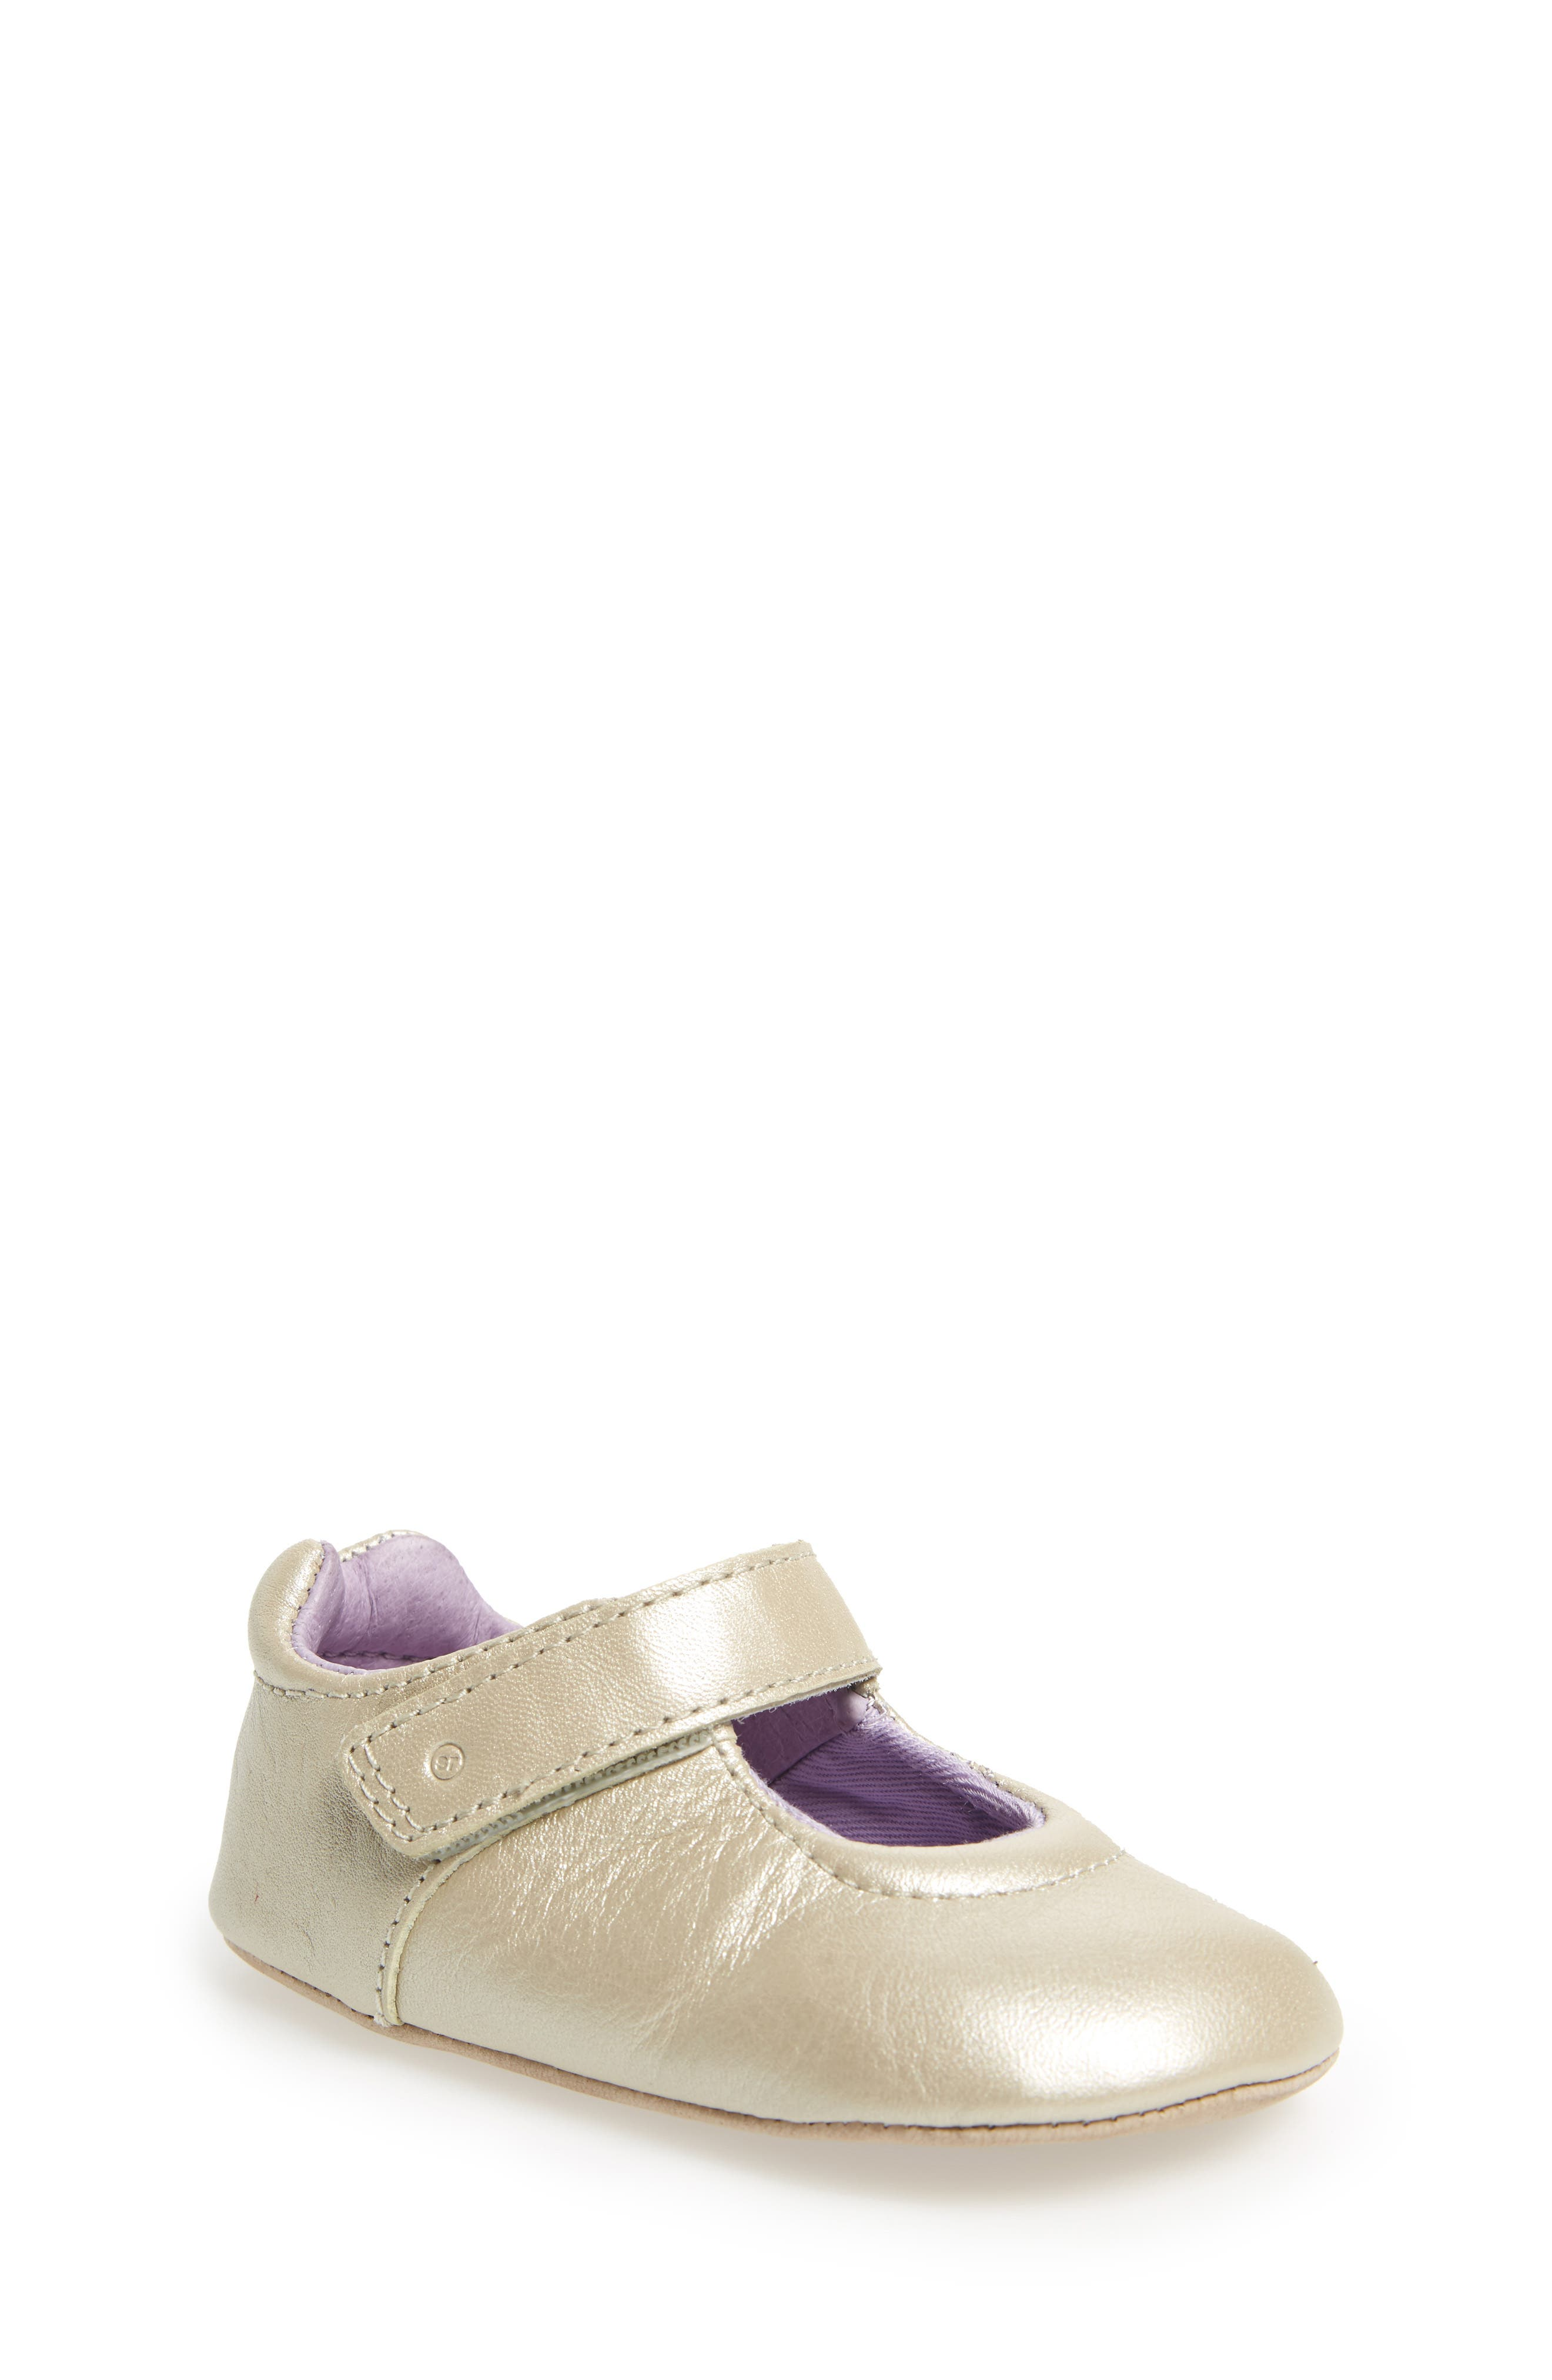 Liza Mary Jane Crib Shoe,                         Main,                         color, Champagne Leather